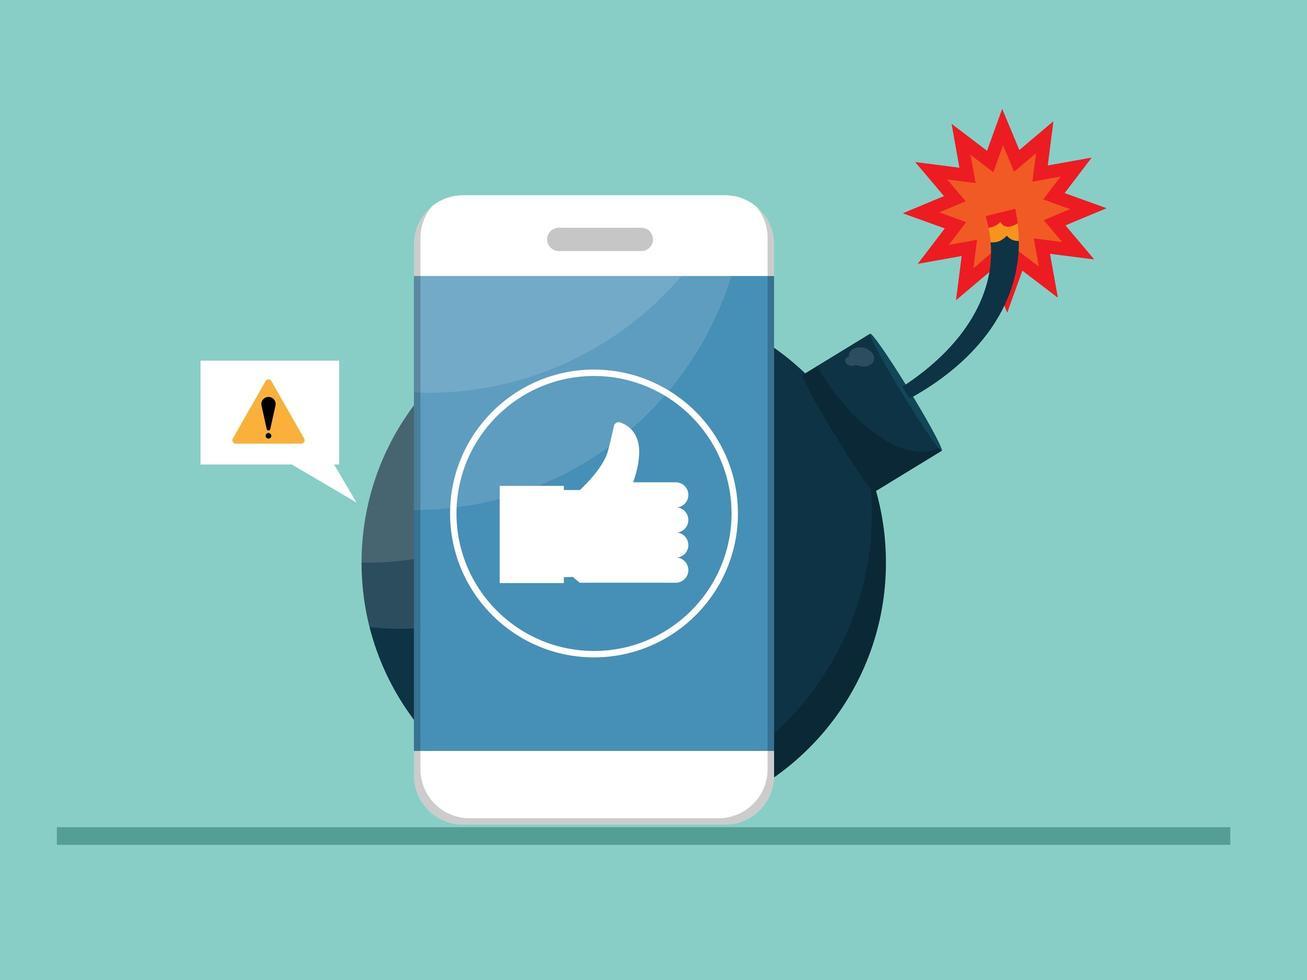 Smartphone mit großer Bombe, Gefahr durch Social-Media-Konzept vektor